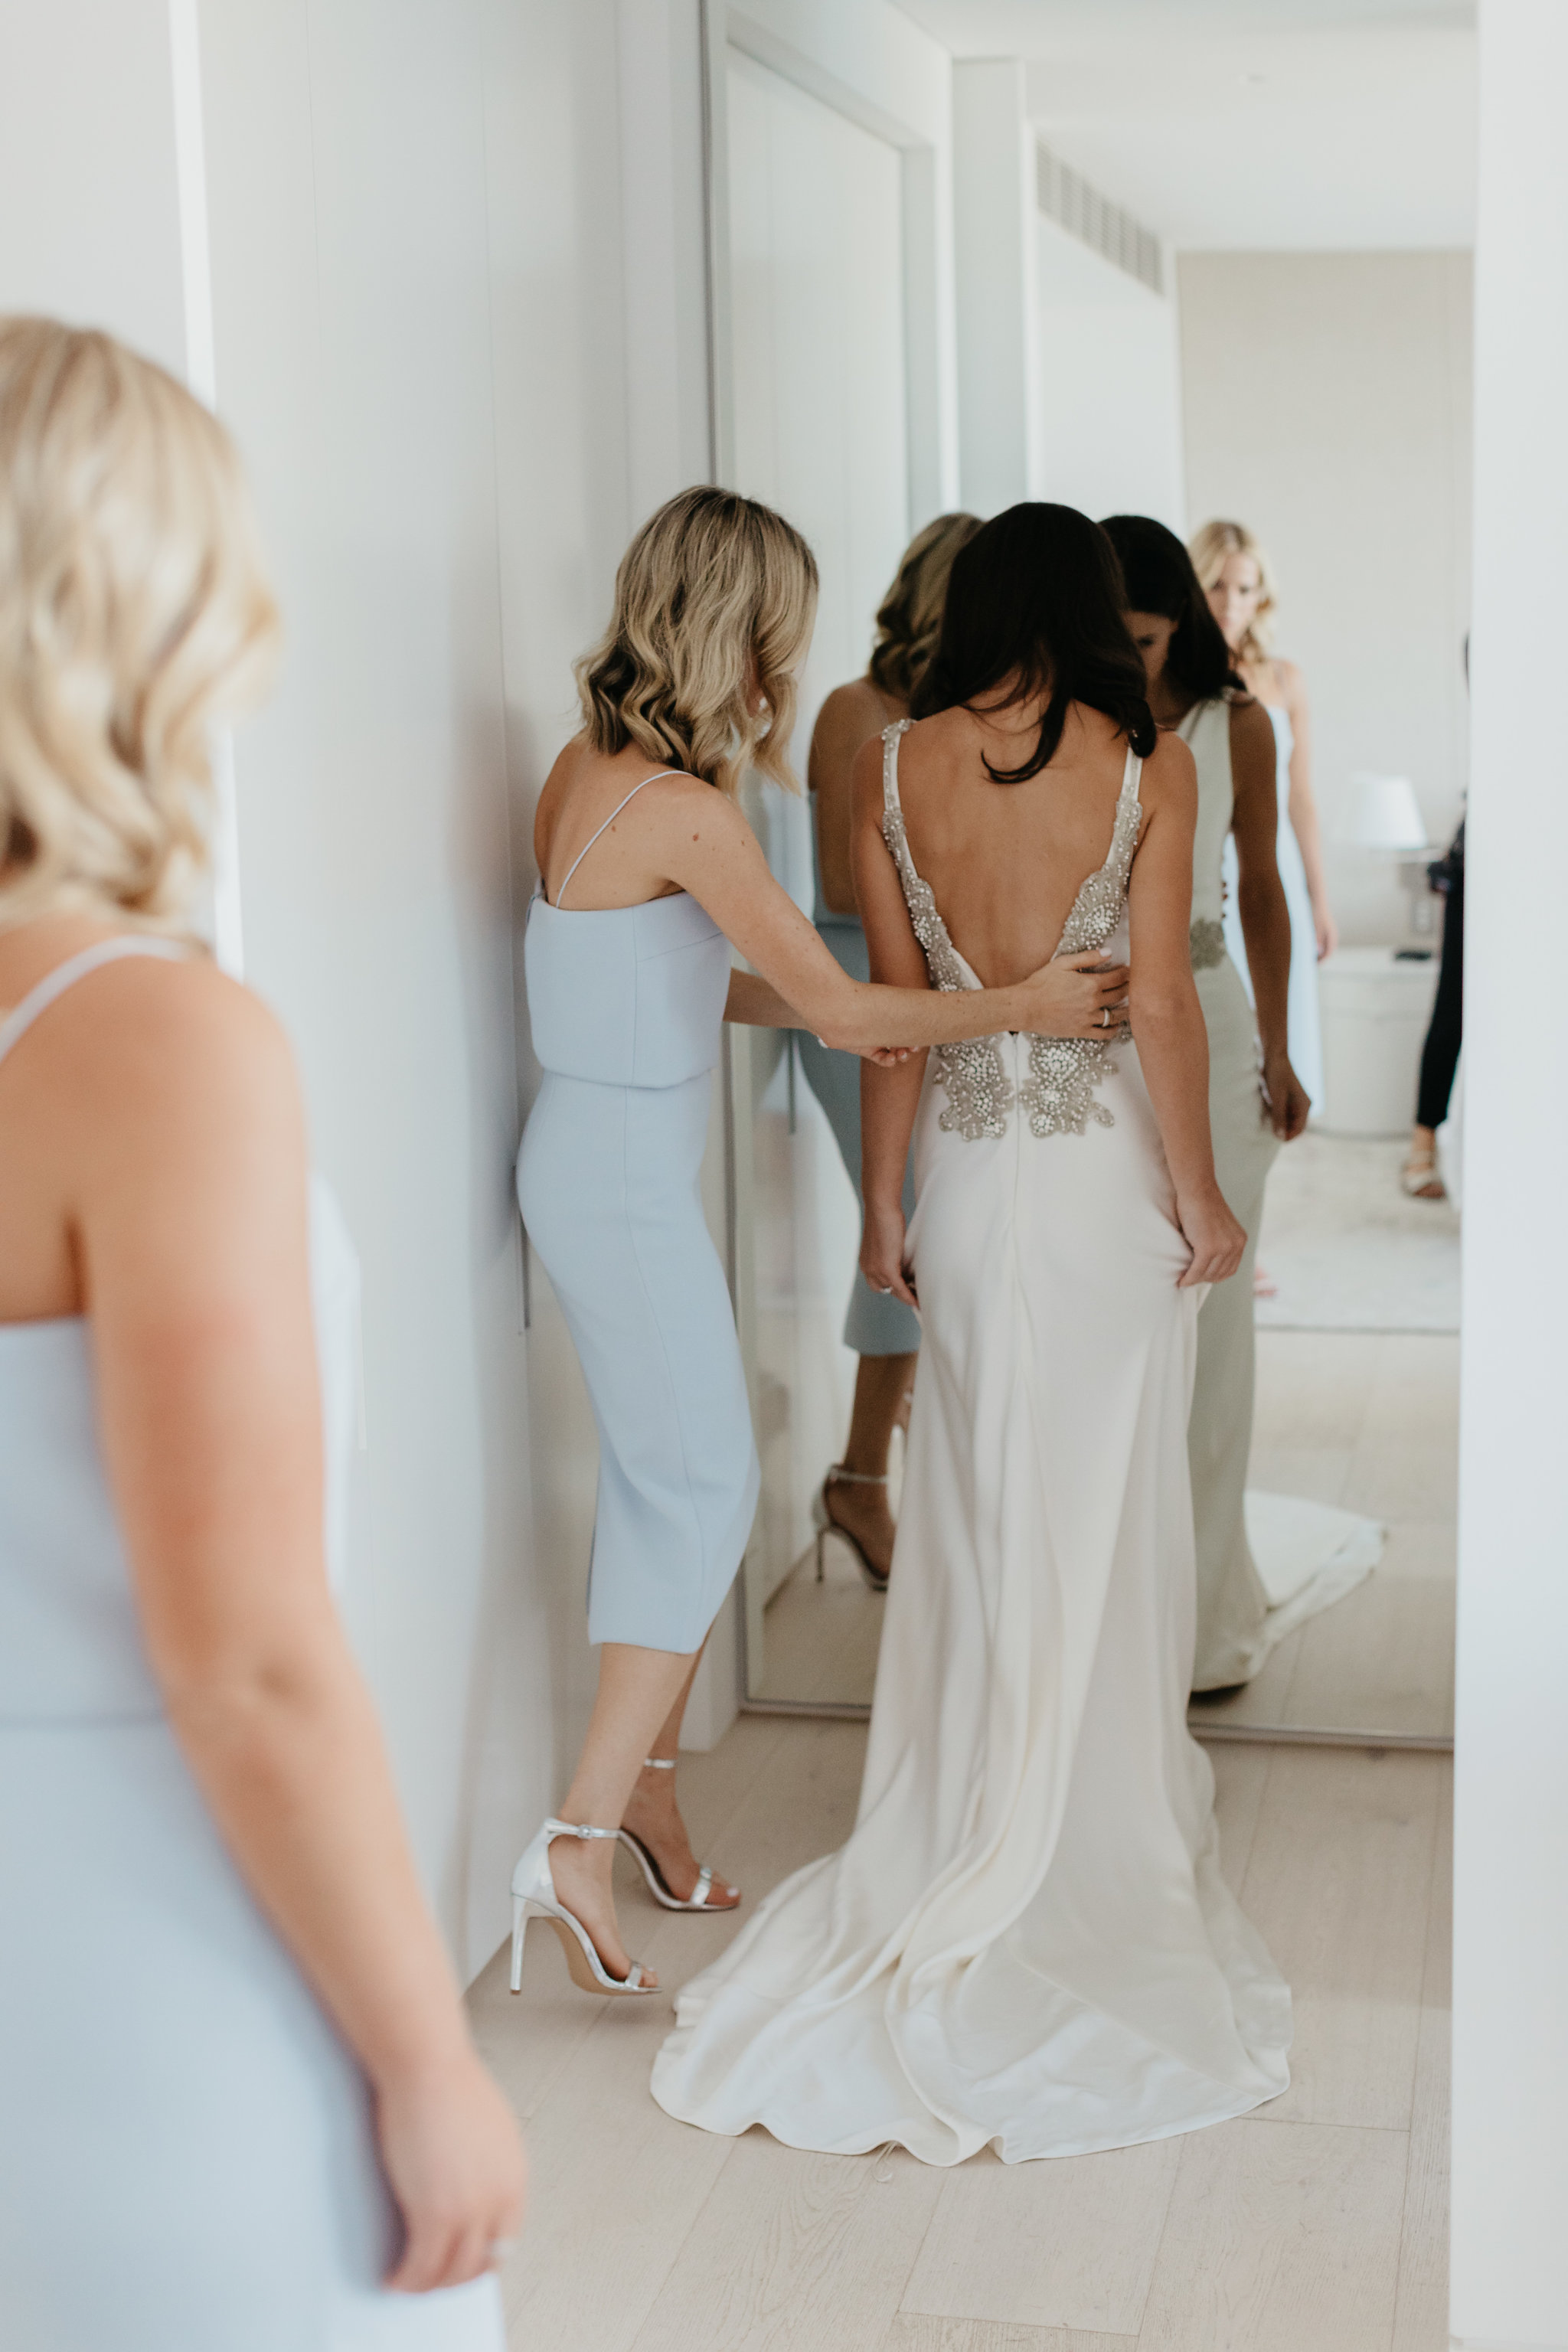 gen_chris_story_of_us_wedding-0165.JPG